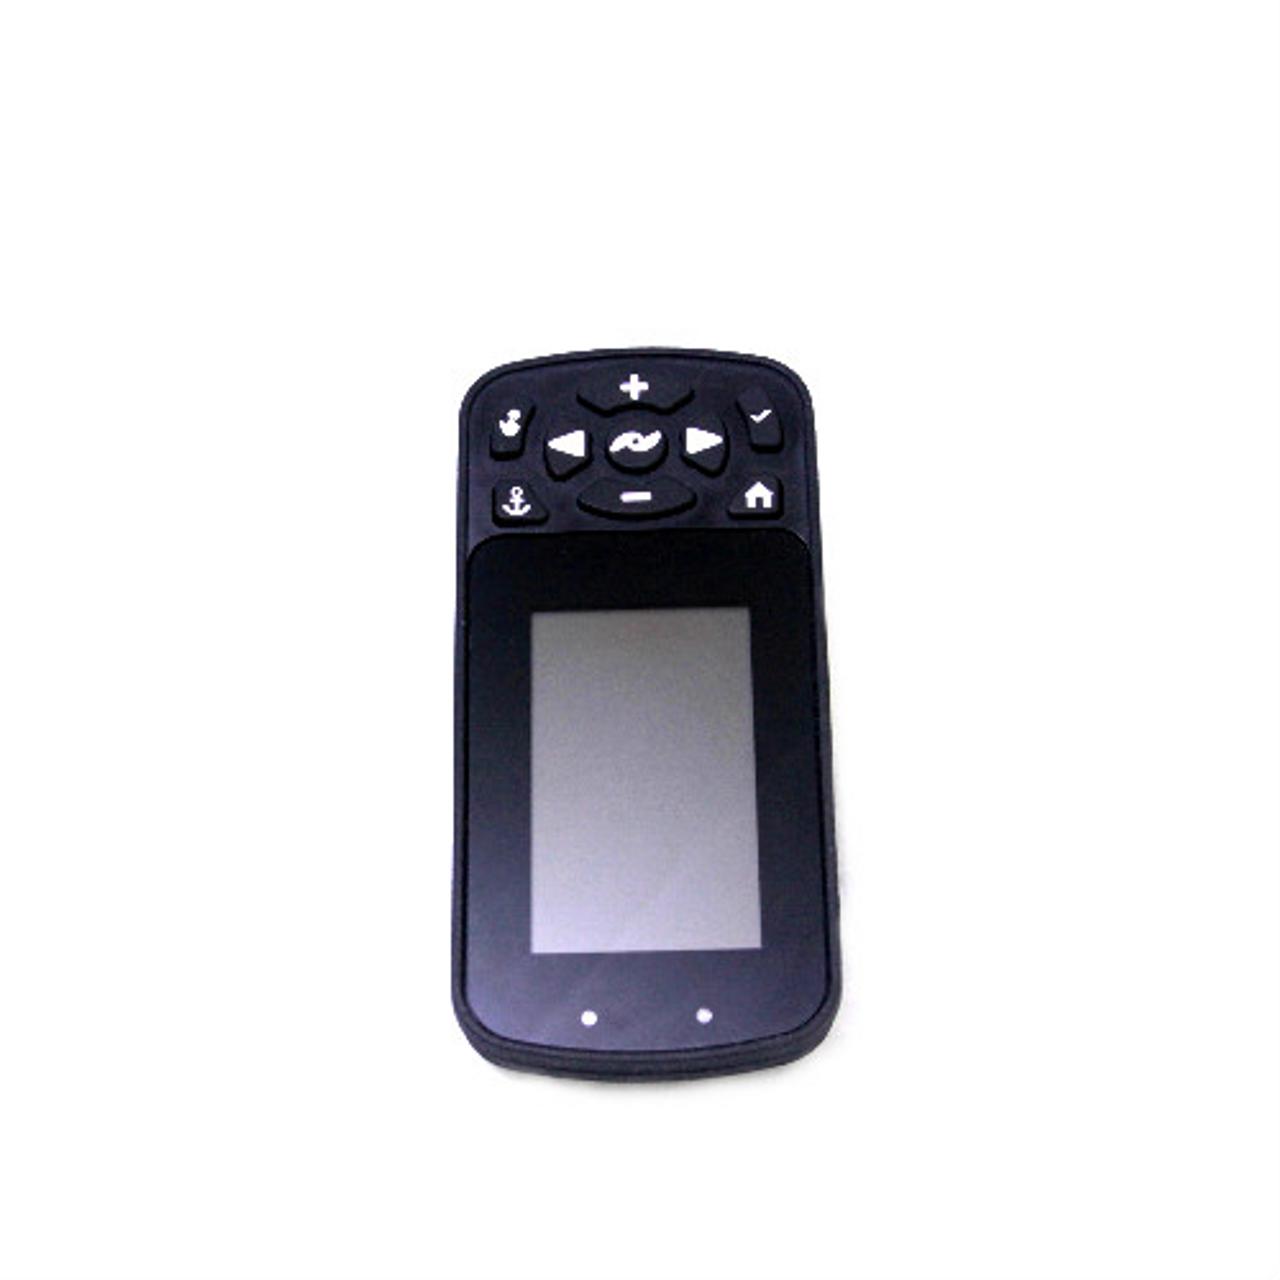 iPilot Remote 2390800 Minn Kota Lanyard w//Carabineer